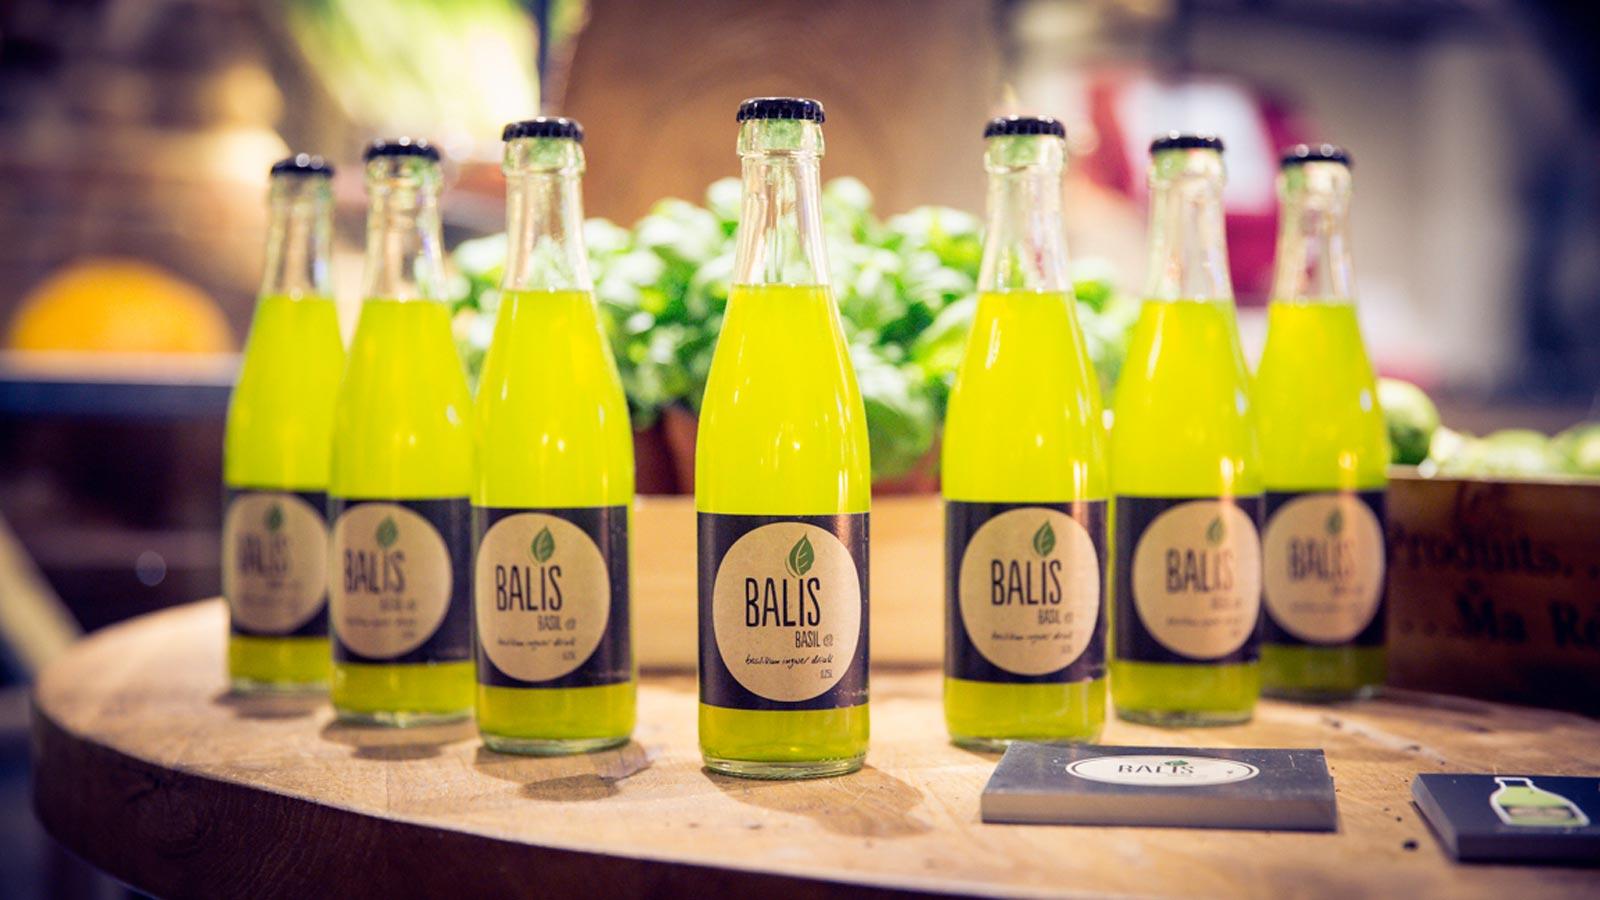 BALIS Basil Produkt